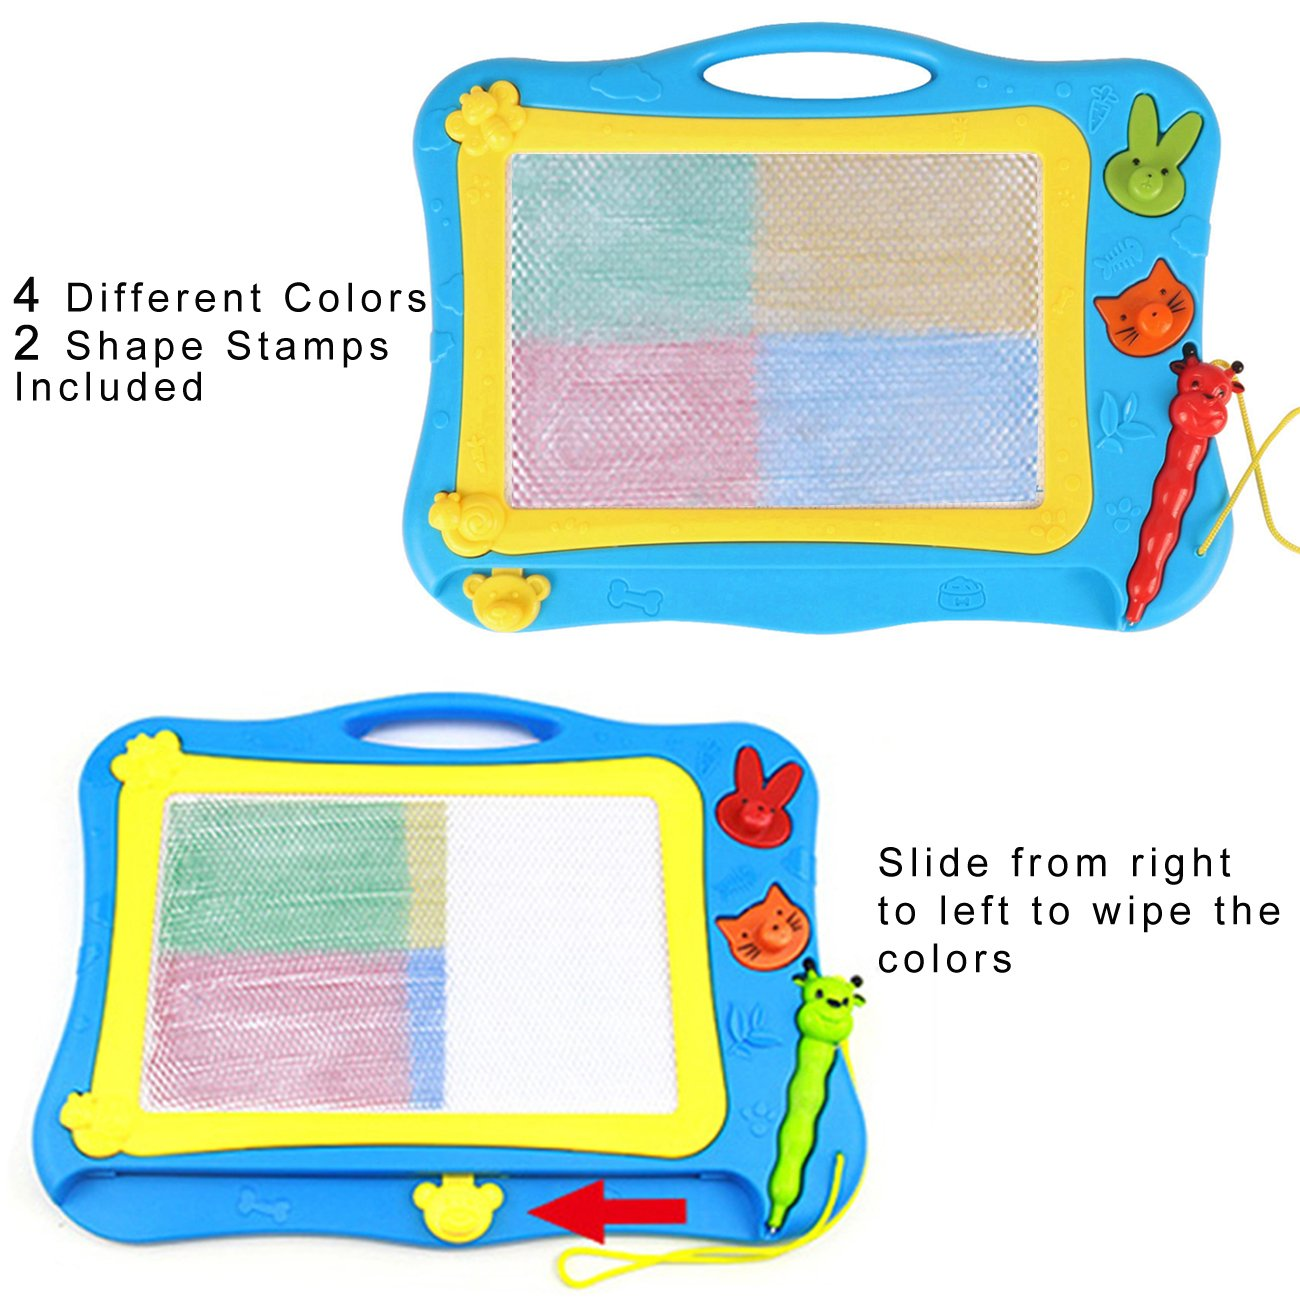 DUTISON Pizarra Magnética Colorido Almohadilla Borrable de Escritura y Dibujo con Pluma para Niños Portátil Tamaño 31 x 21.5 cm (Azul 001)